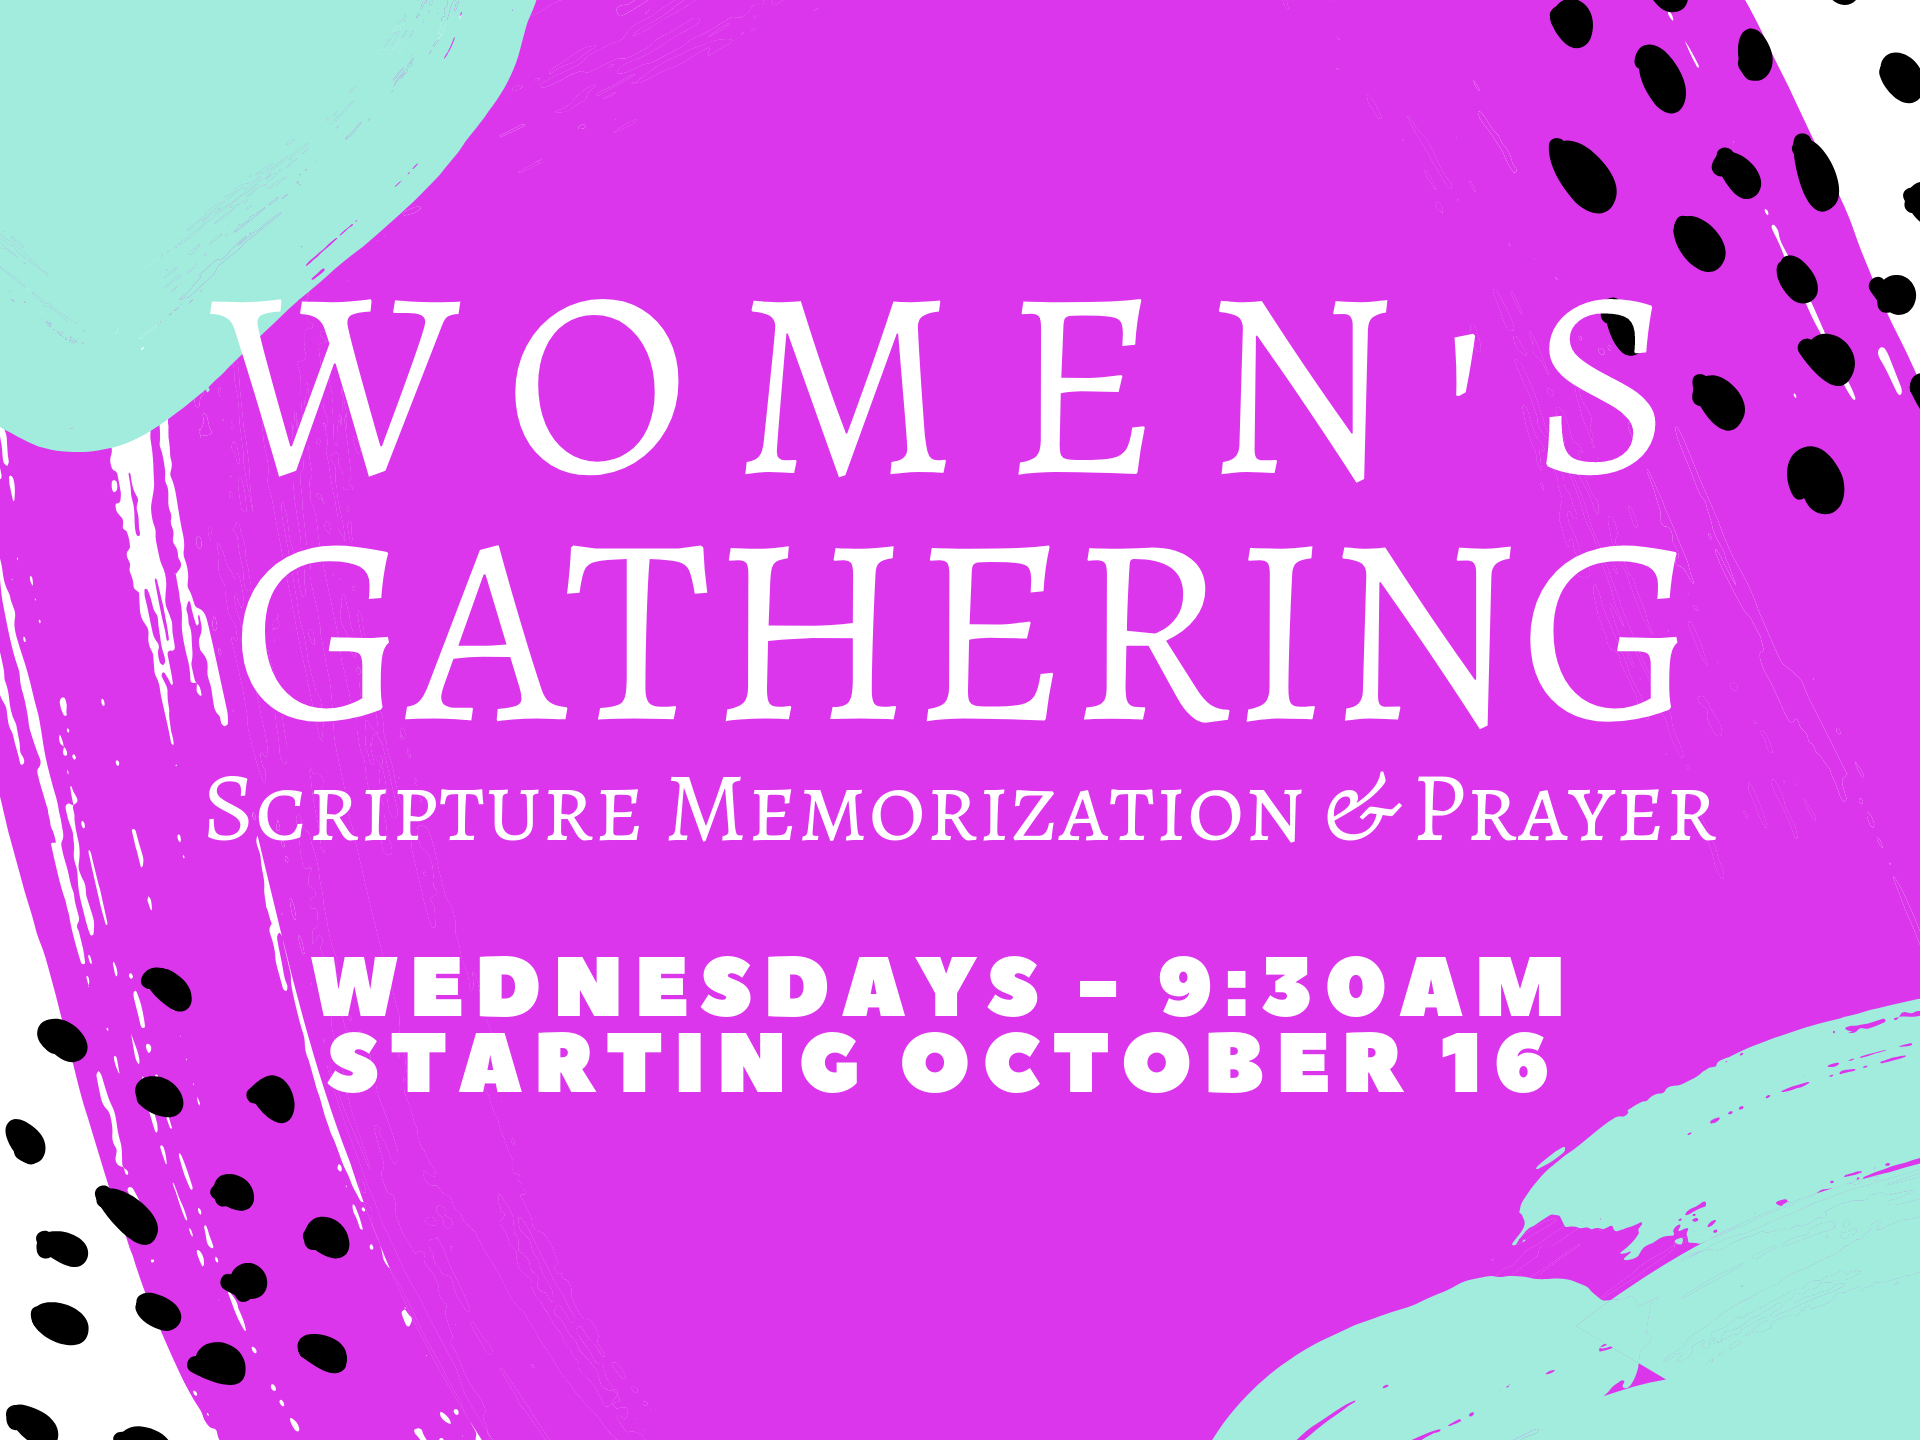 Womens Gatherings.png